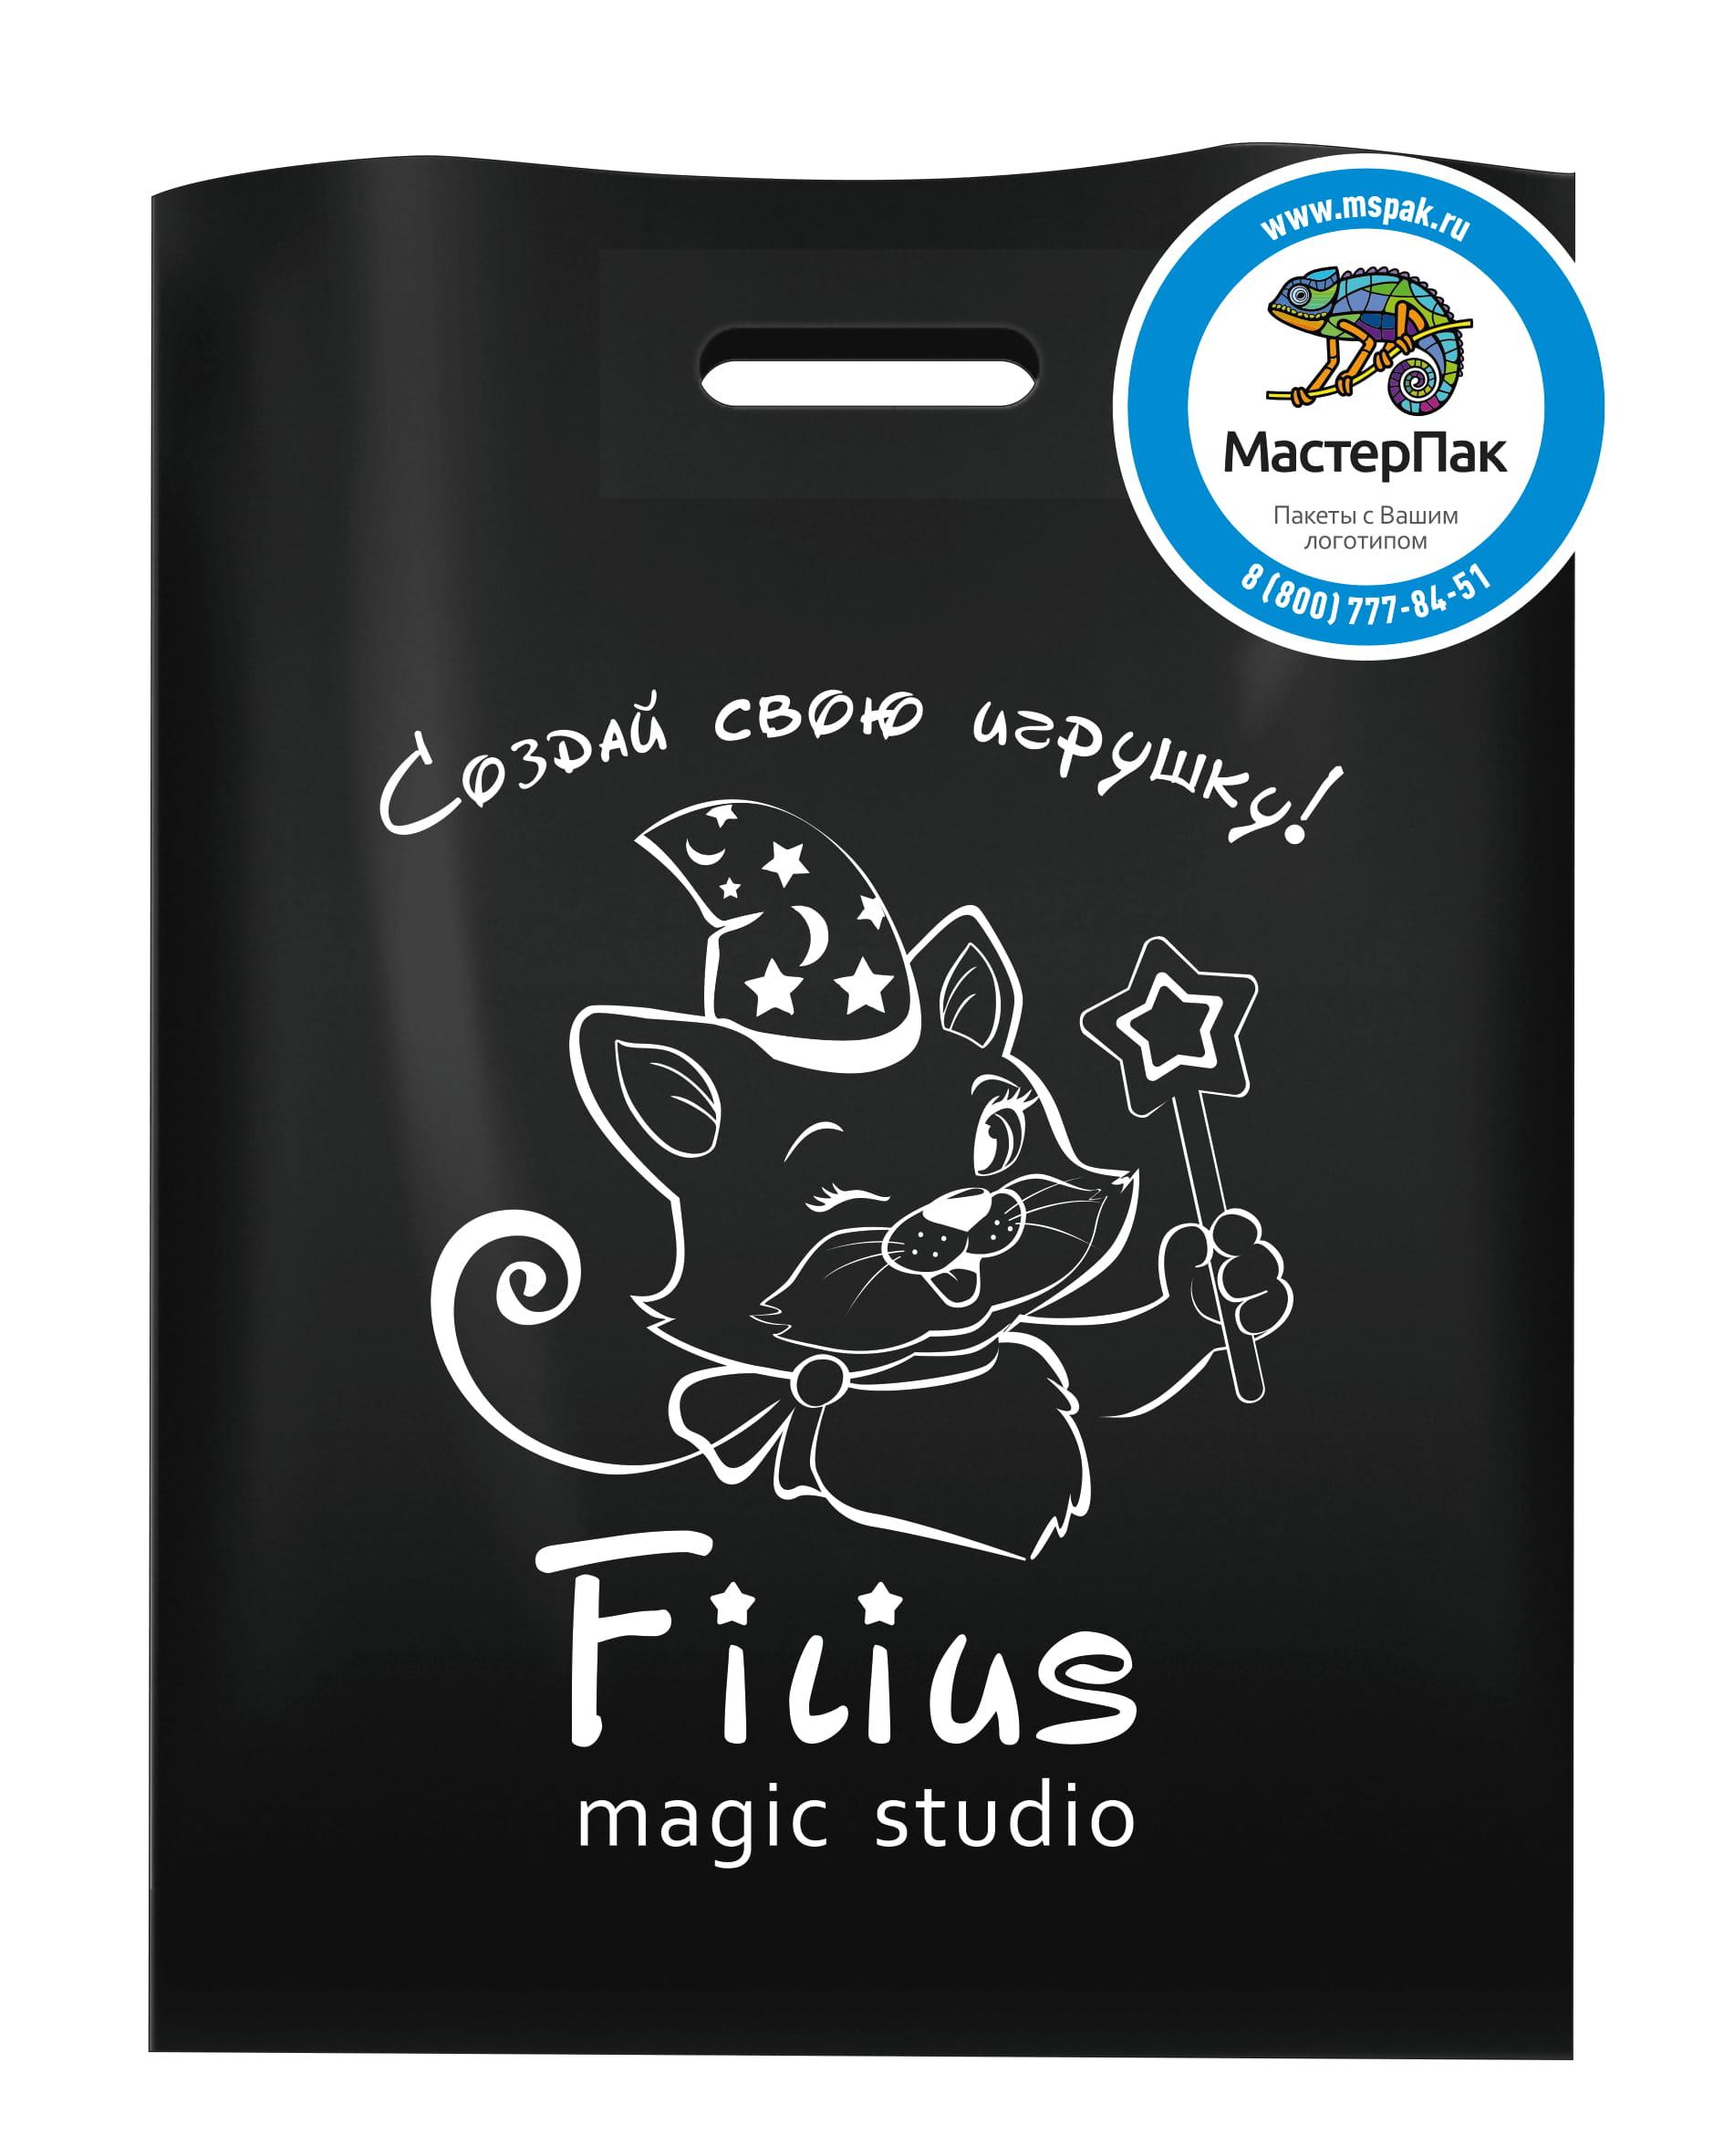 Пакет ПВД с логотипом Magic studio Filius,Москва